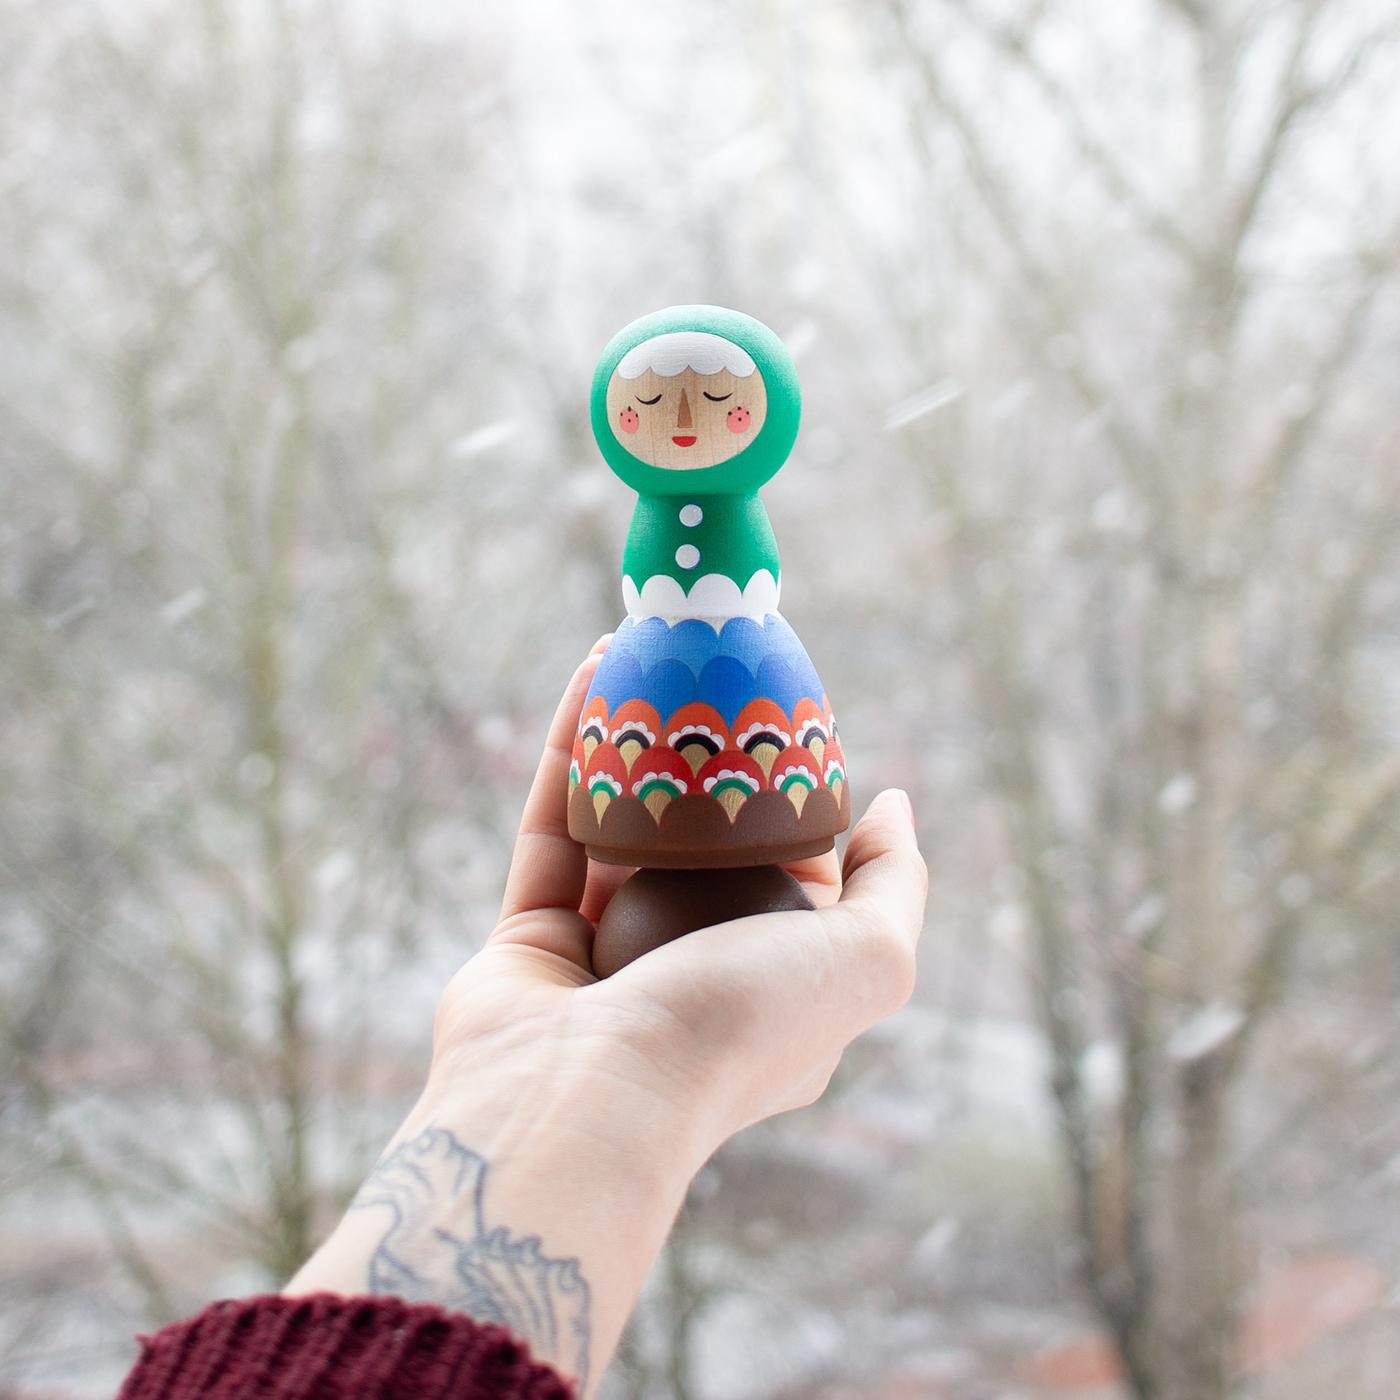 acrylic colorful cool crafts   creative design Fun handmade kids wood